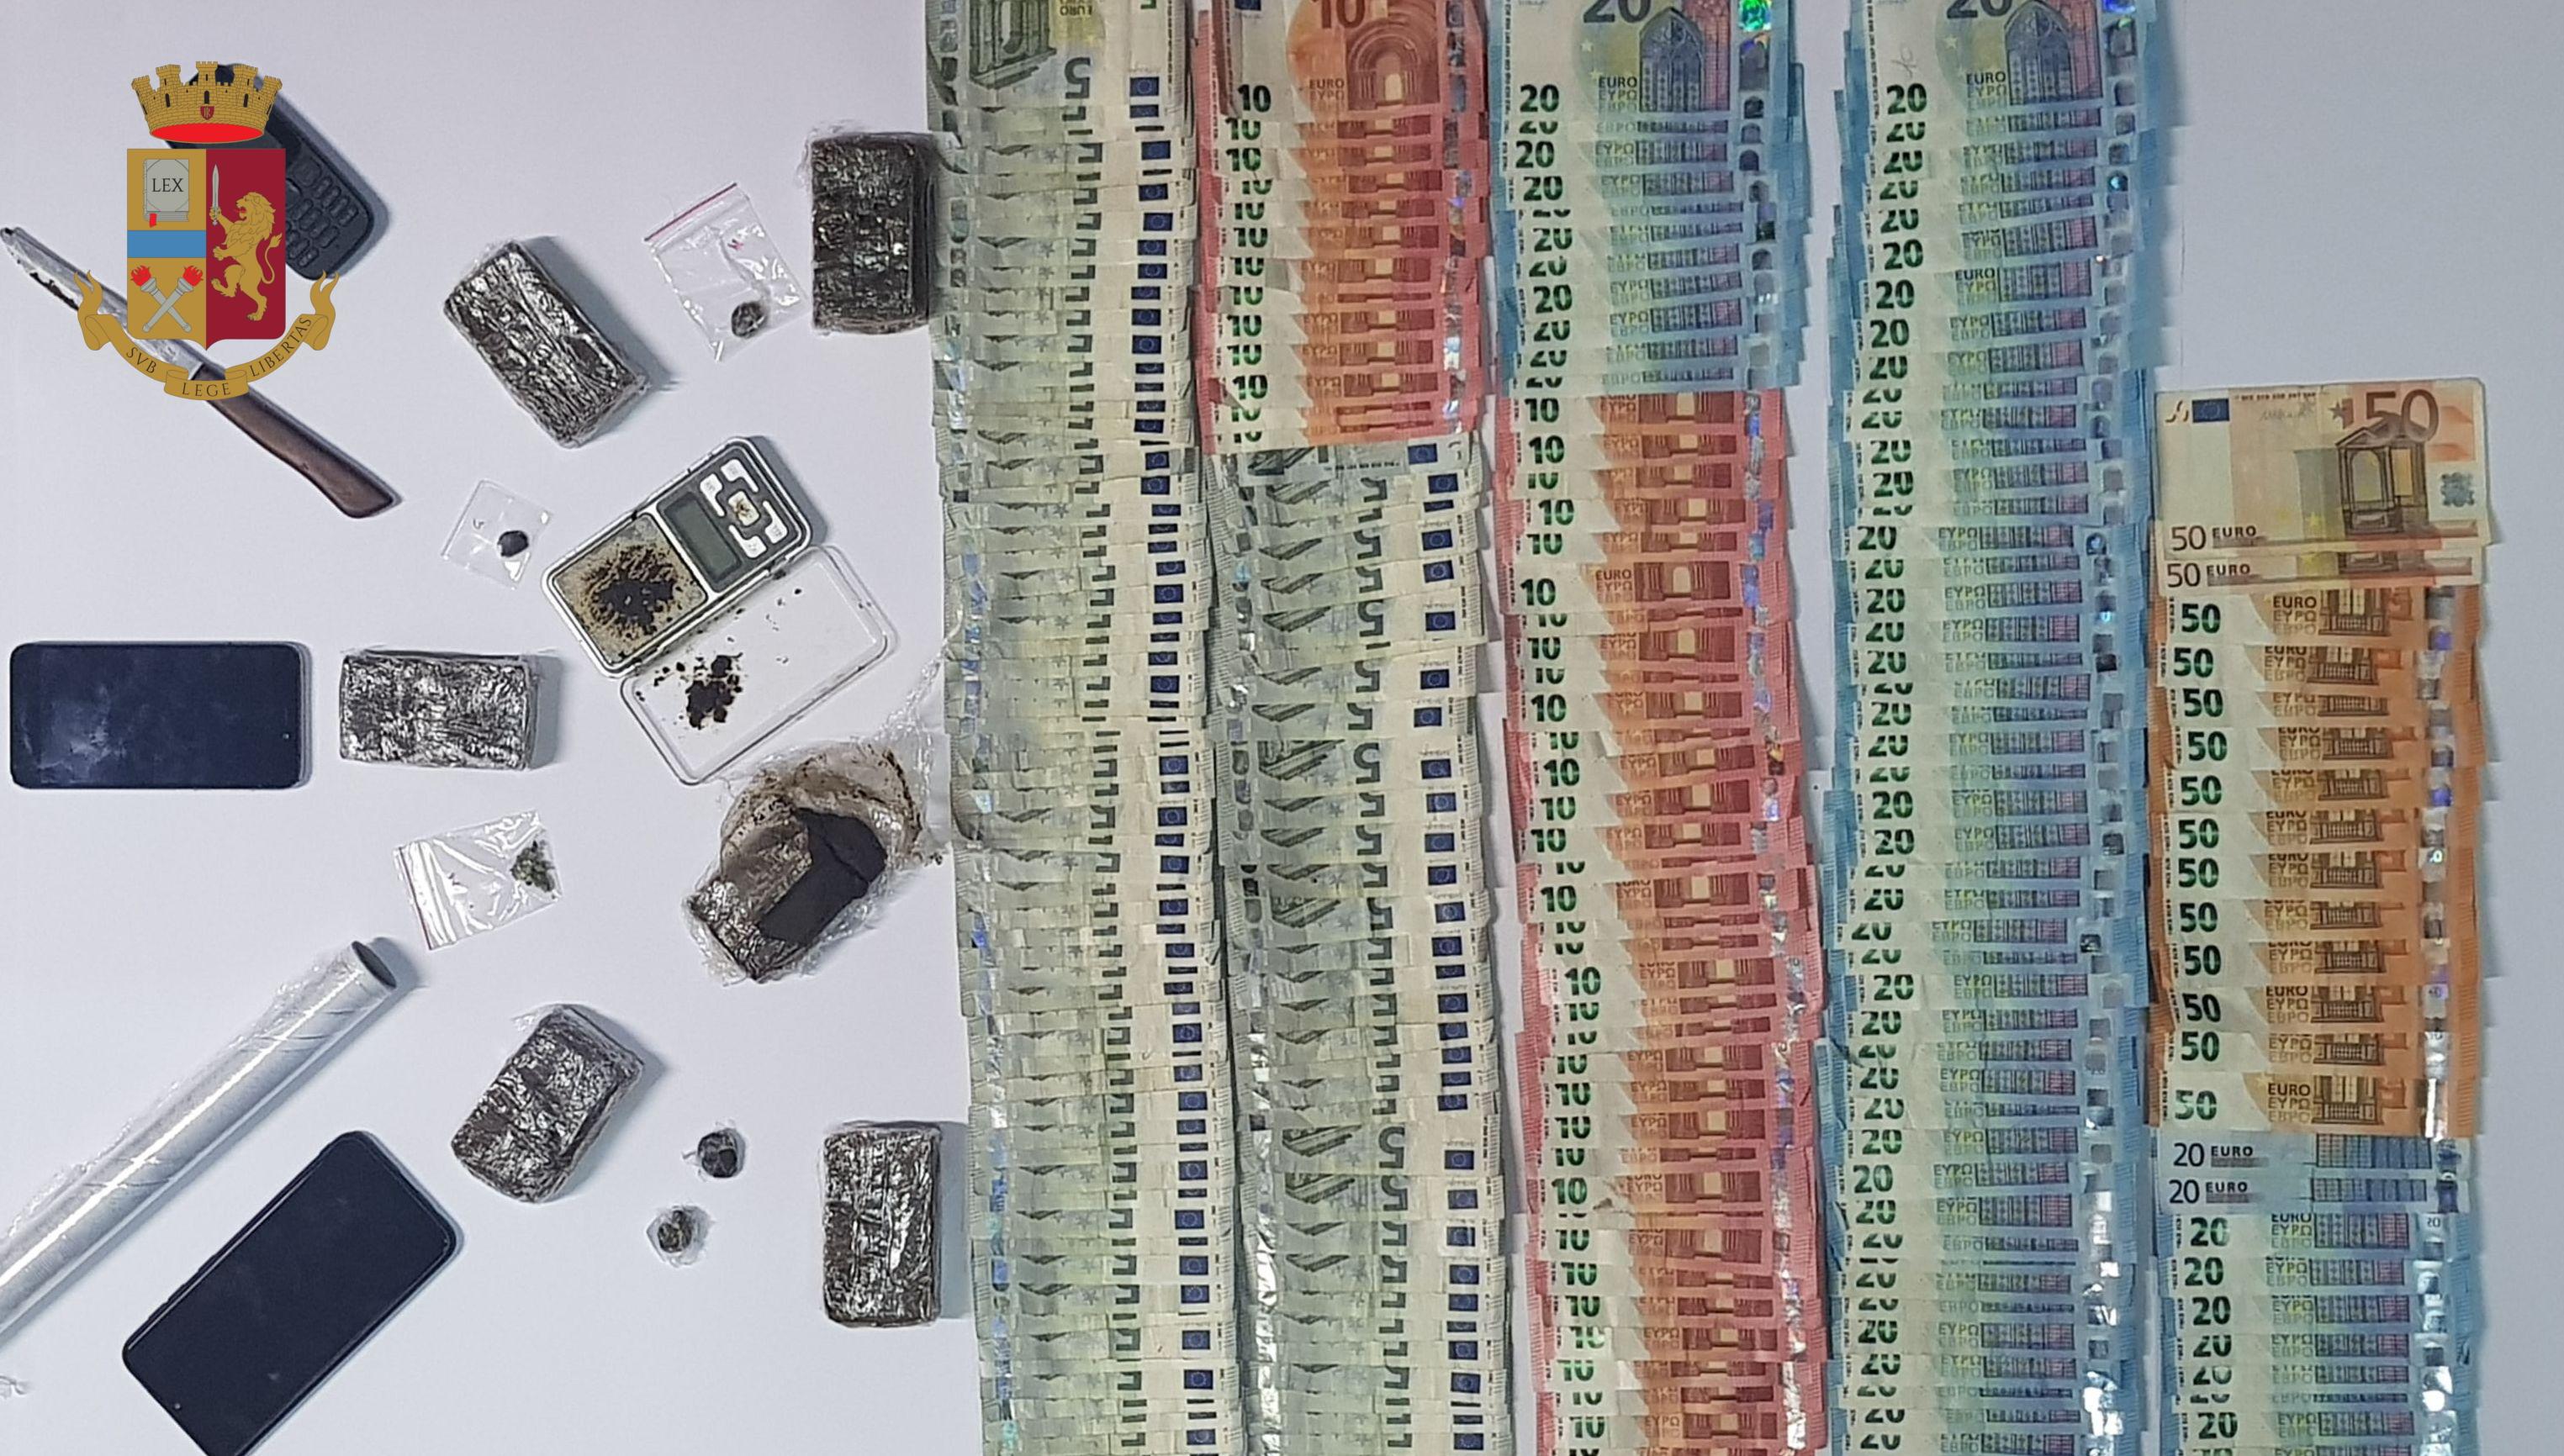 ostia-droga-denaro